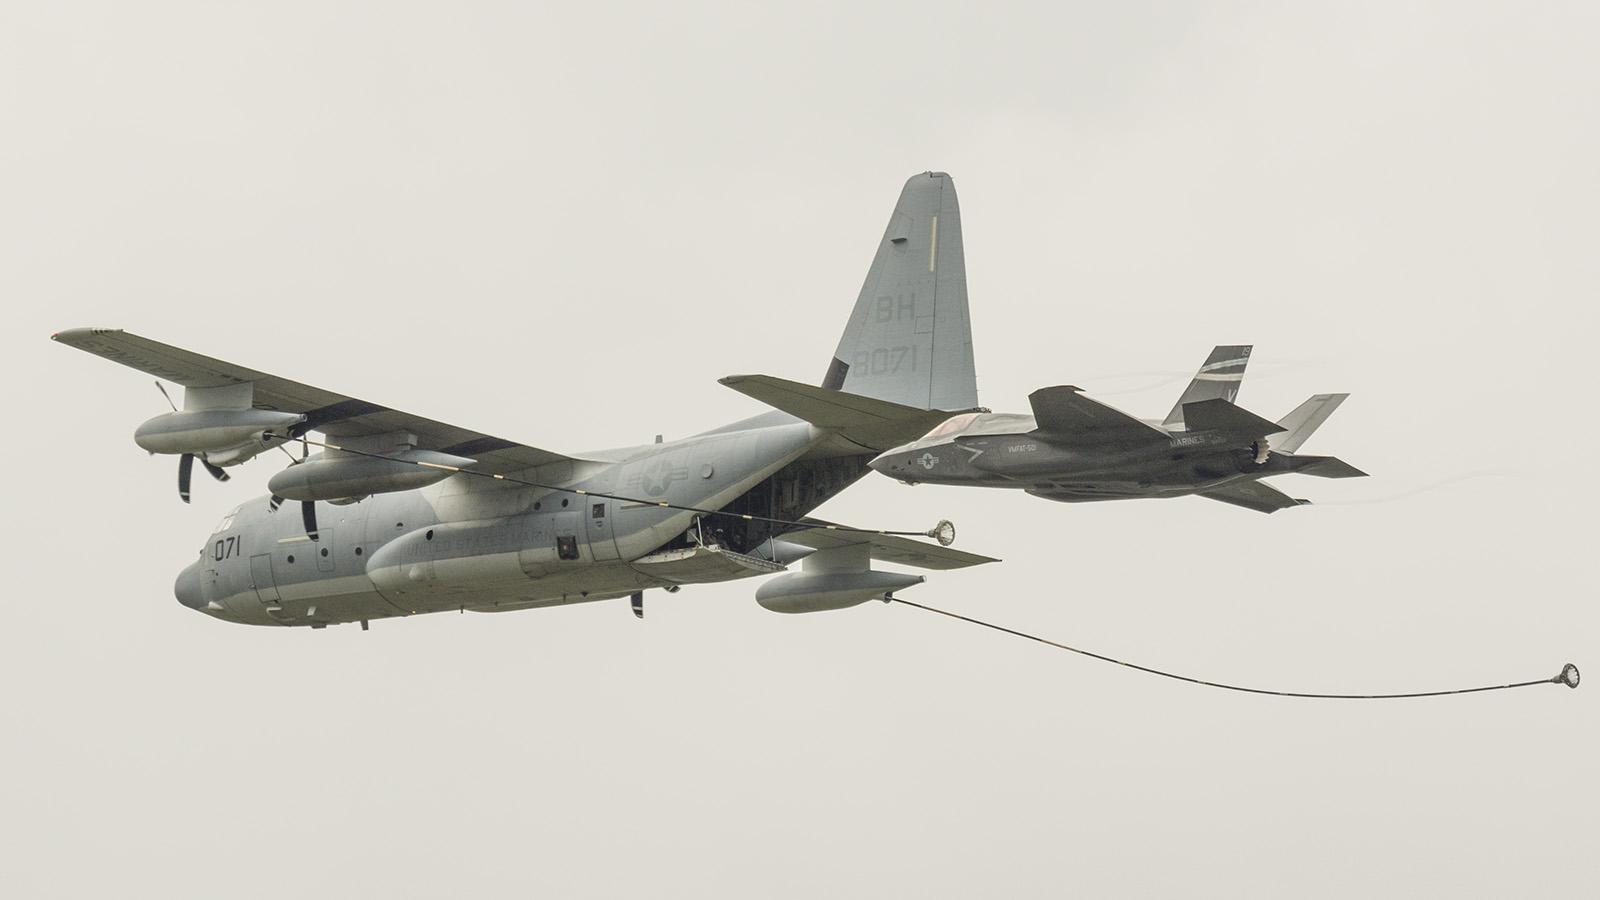 _IMG5601 Lockheed Martin F-35B Lightning II US Marines 168727 with C-130 tanker s